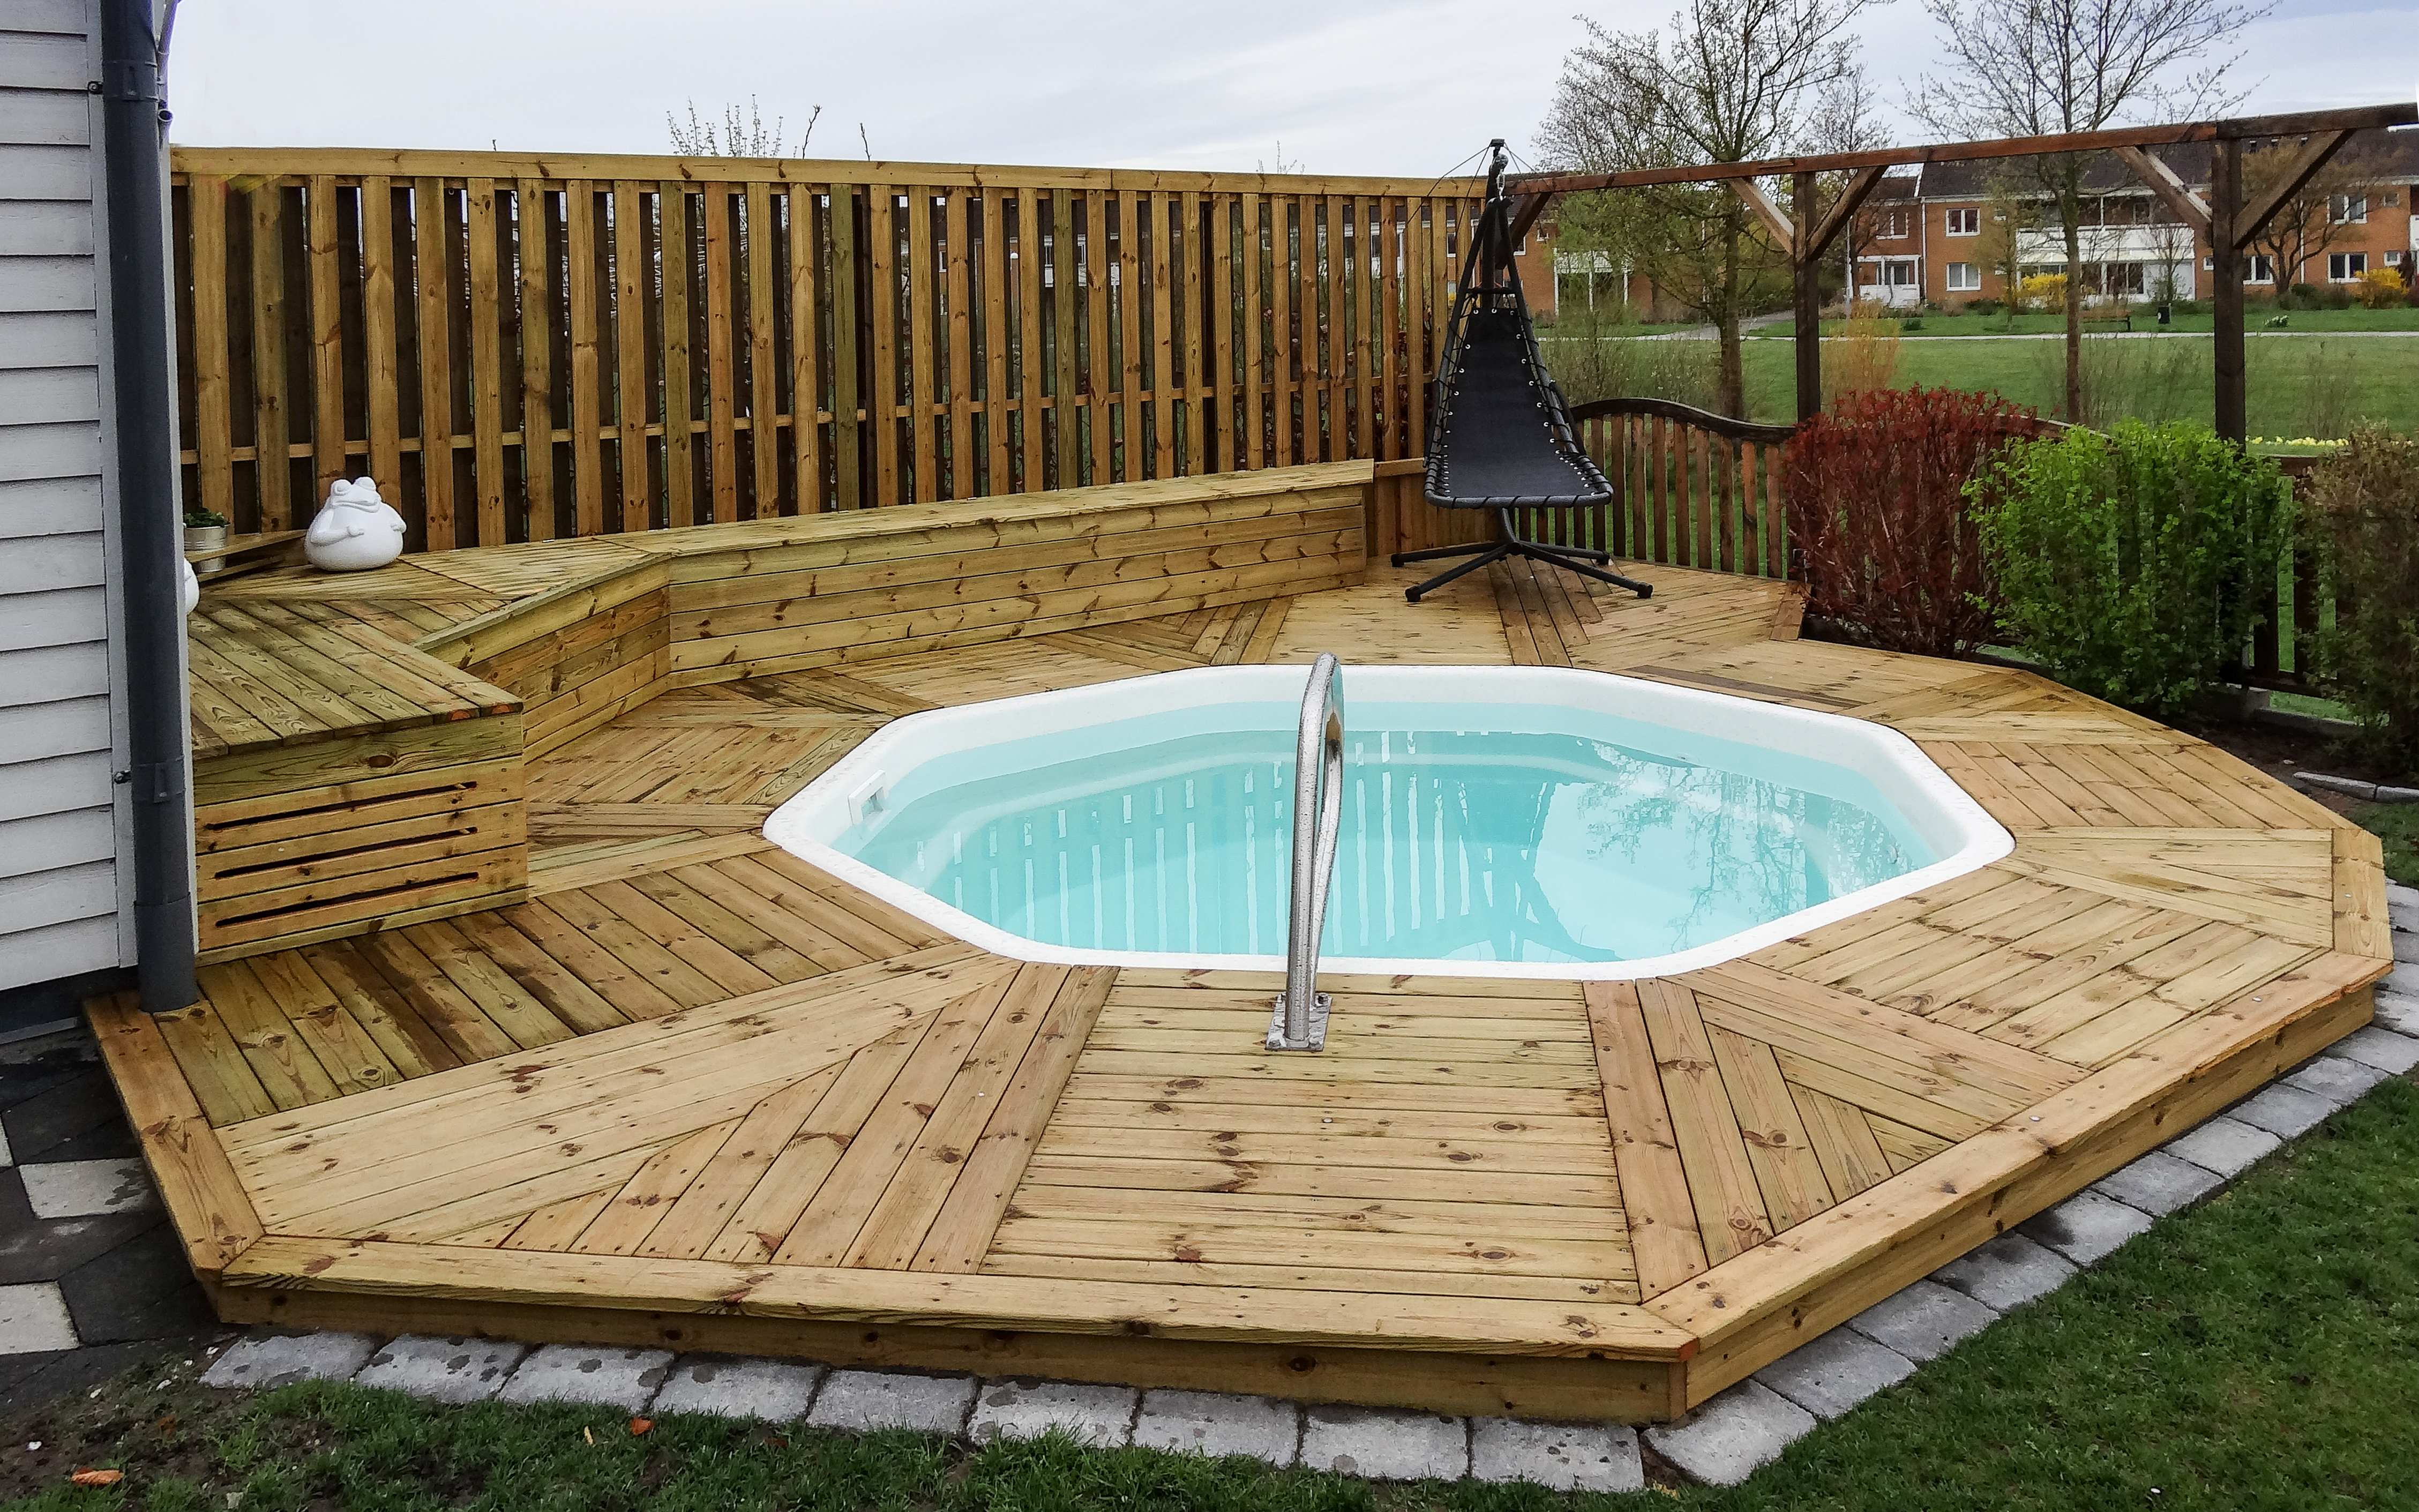 Oktagon Familypool - Liten pool - åttakantig pool - rund pool - omkringliggande trädäck